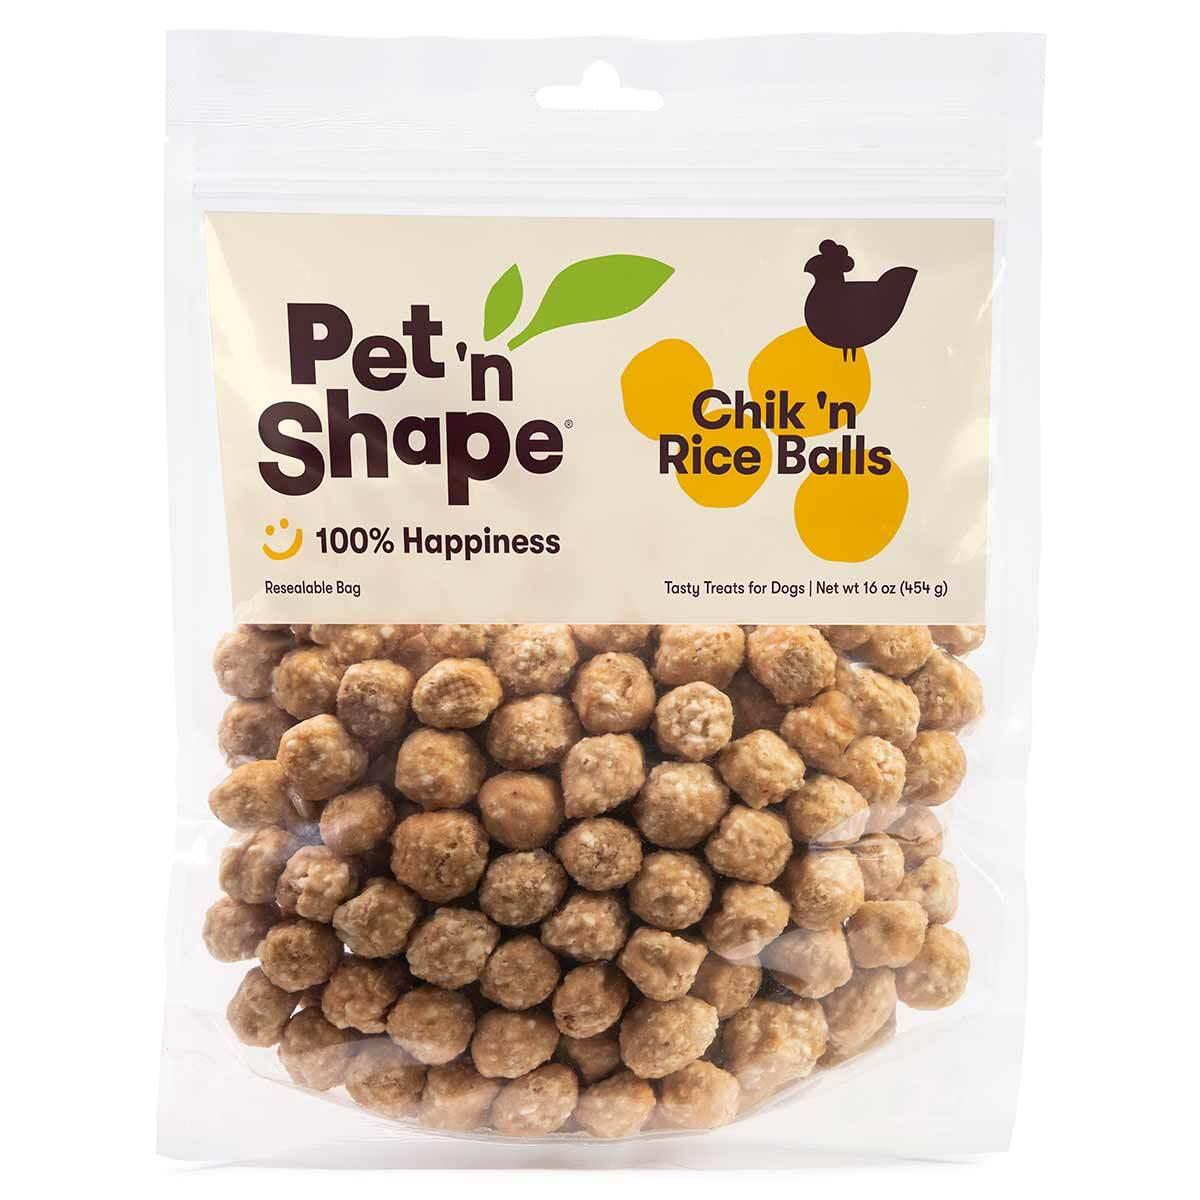 Dog Treats Pet 'n Shape Chik 'n Rice Balls 16 oz